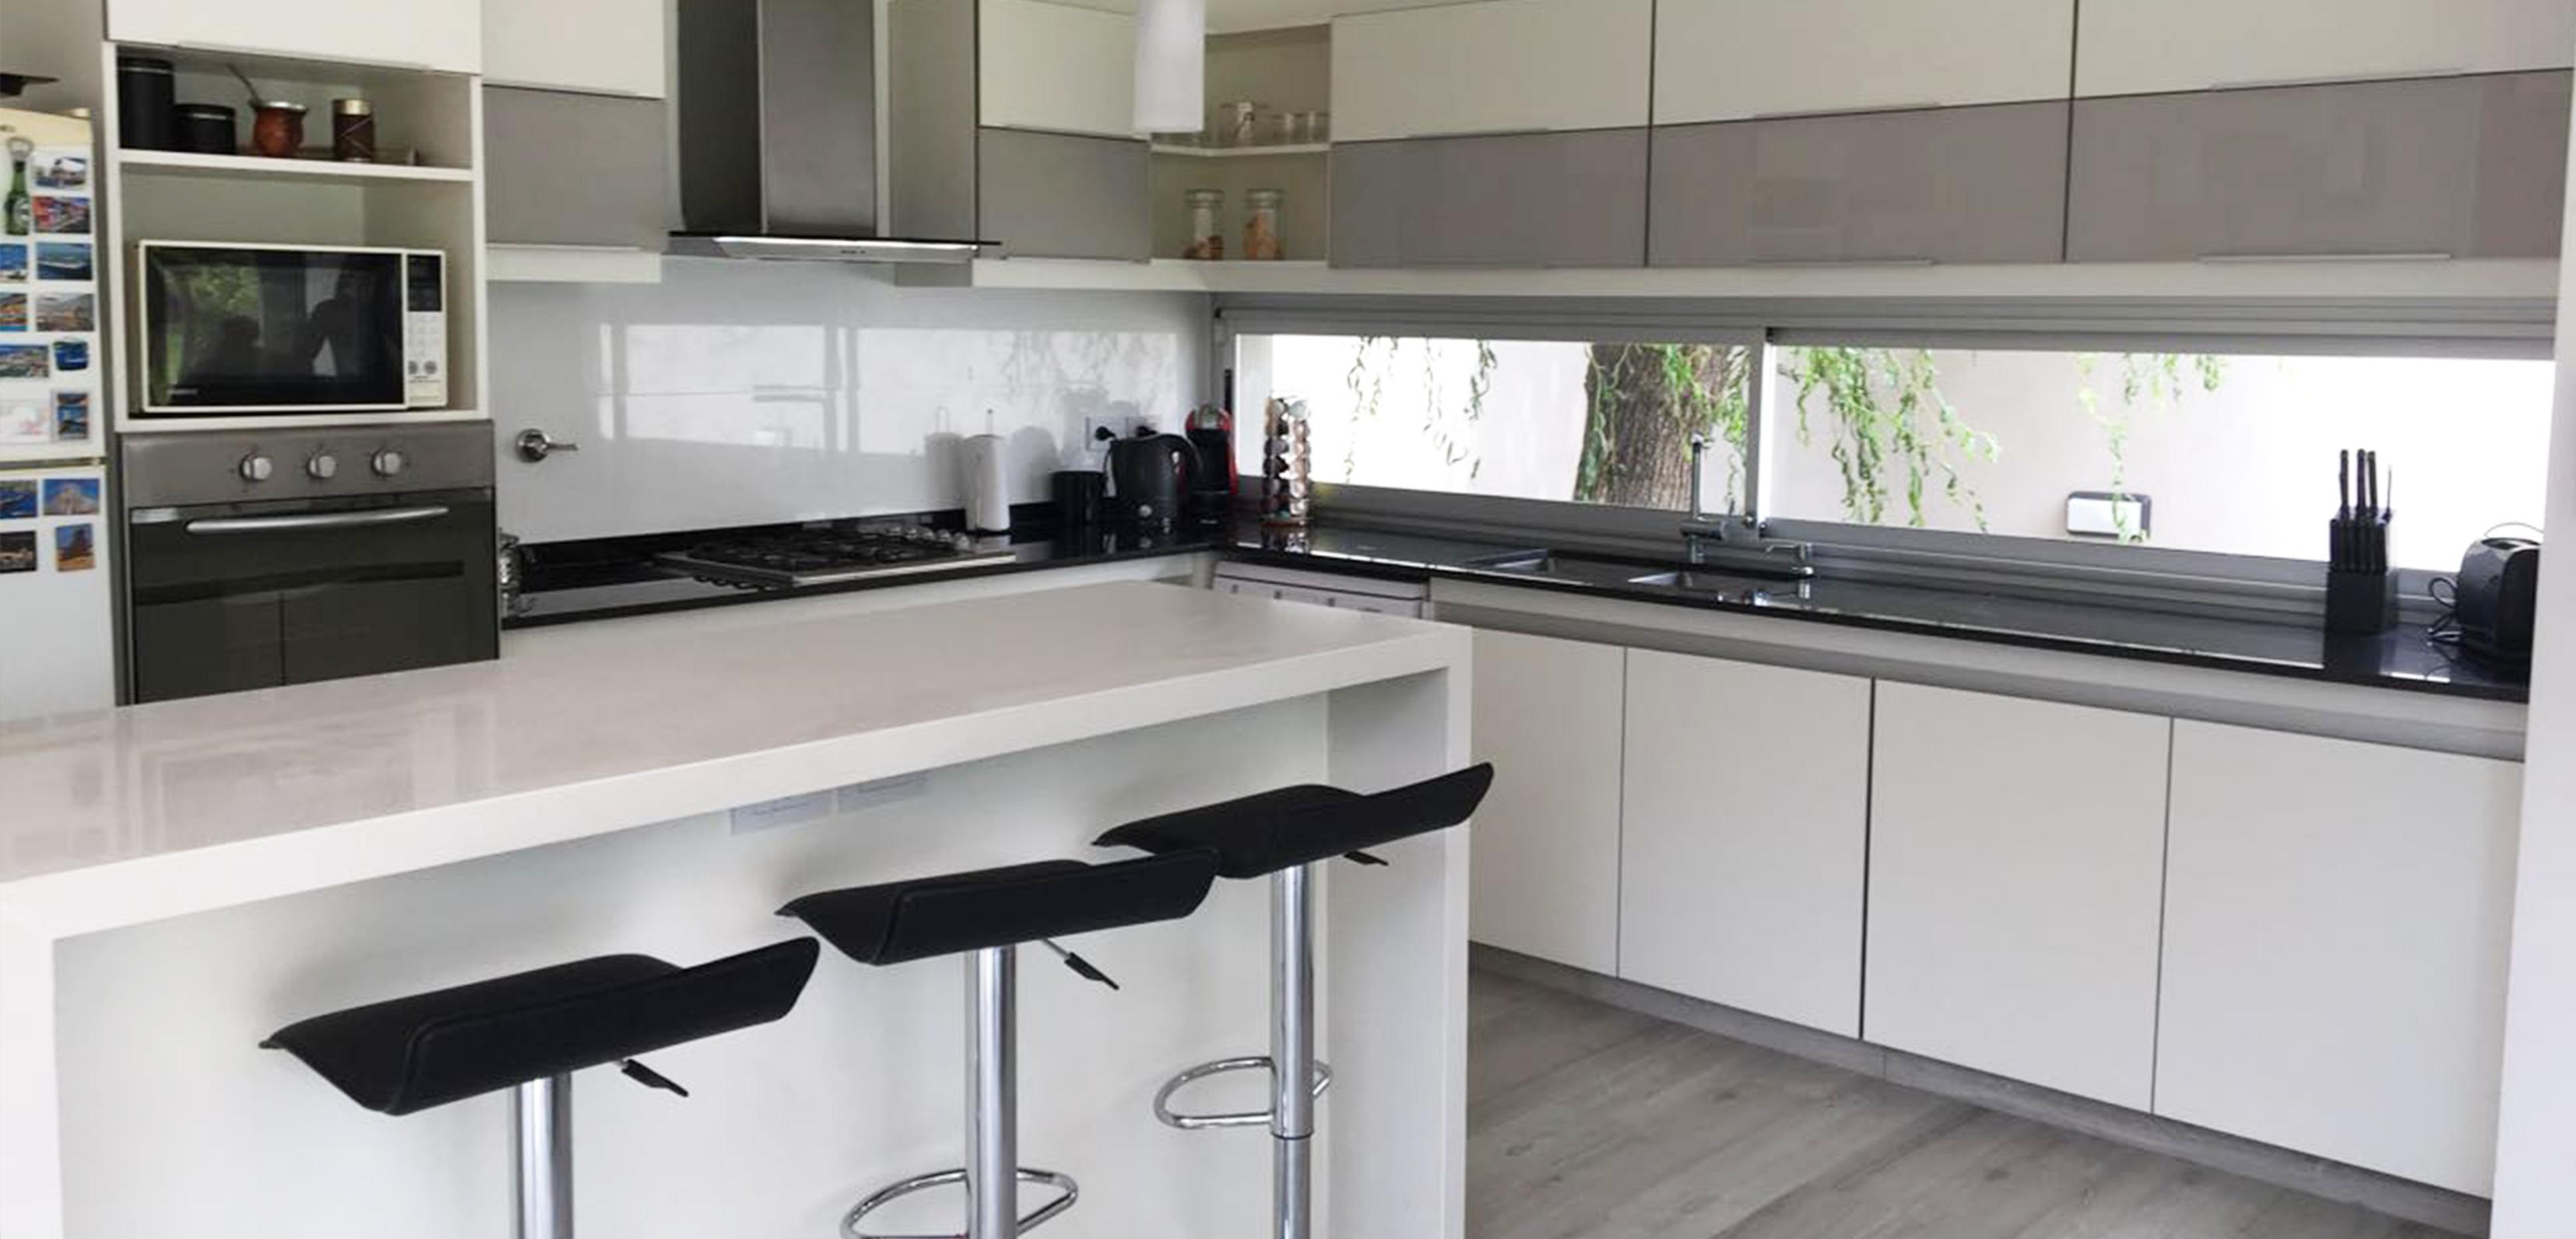 Iacobellis amoblamientos aberturas cocinas pisos sillas for Ver amoblamientos de cocina